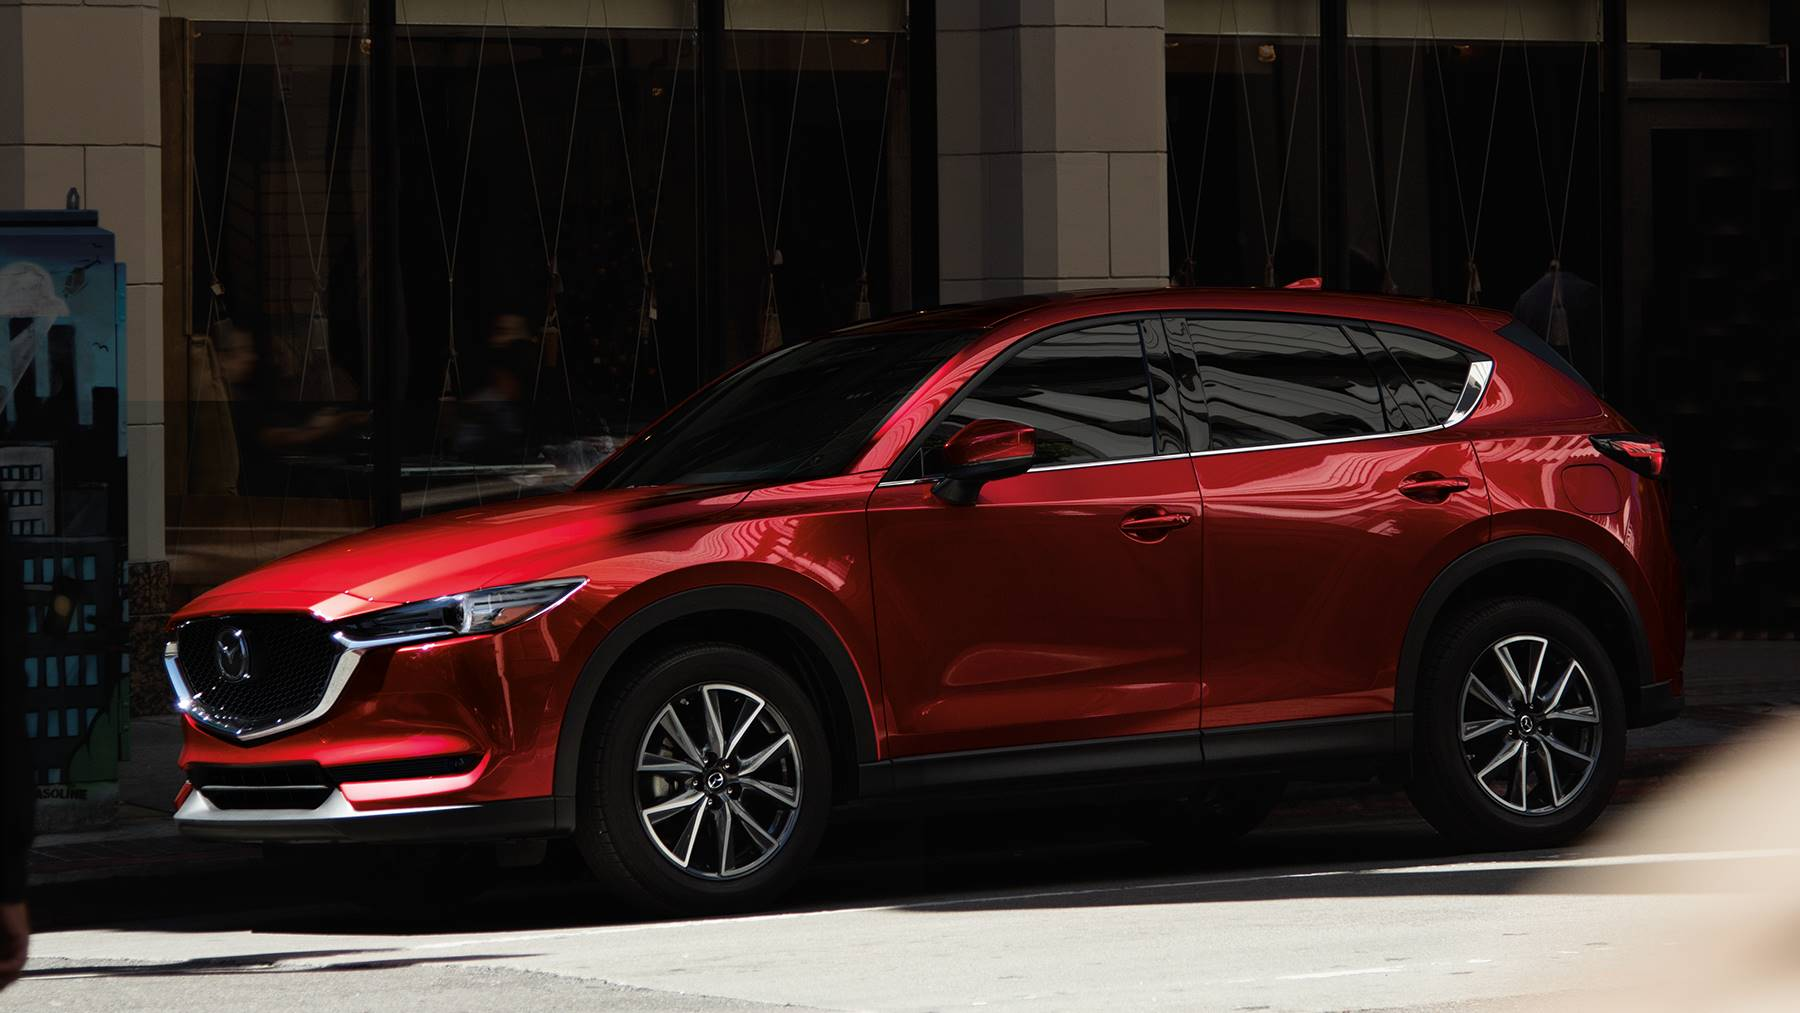 2018 Mazda CX-5 vs 2018 Toyota RAV4 near Pearland, TX